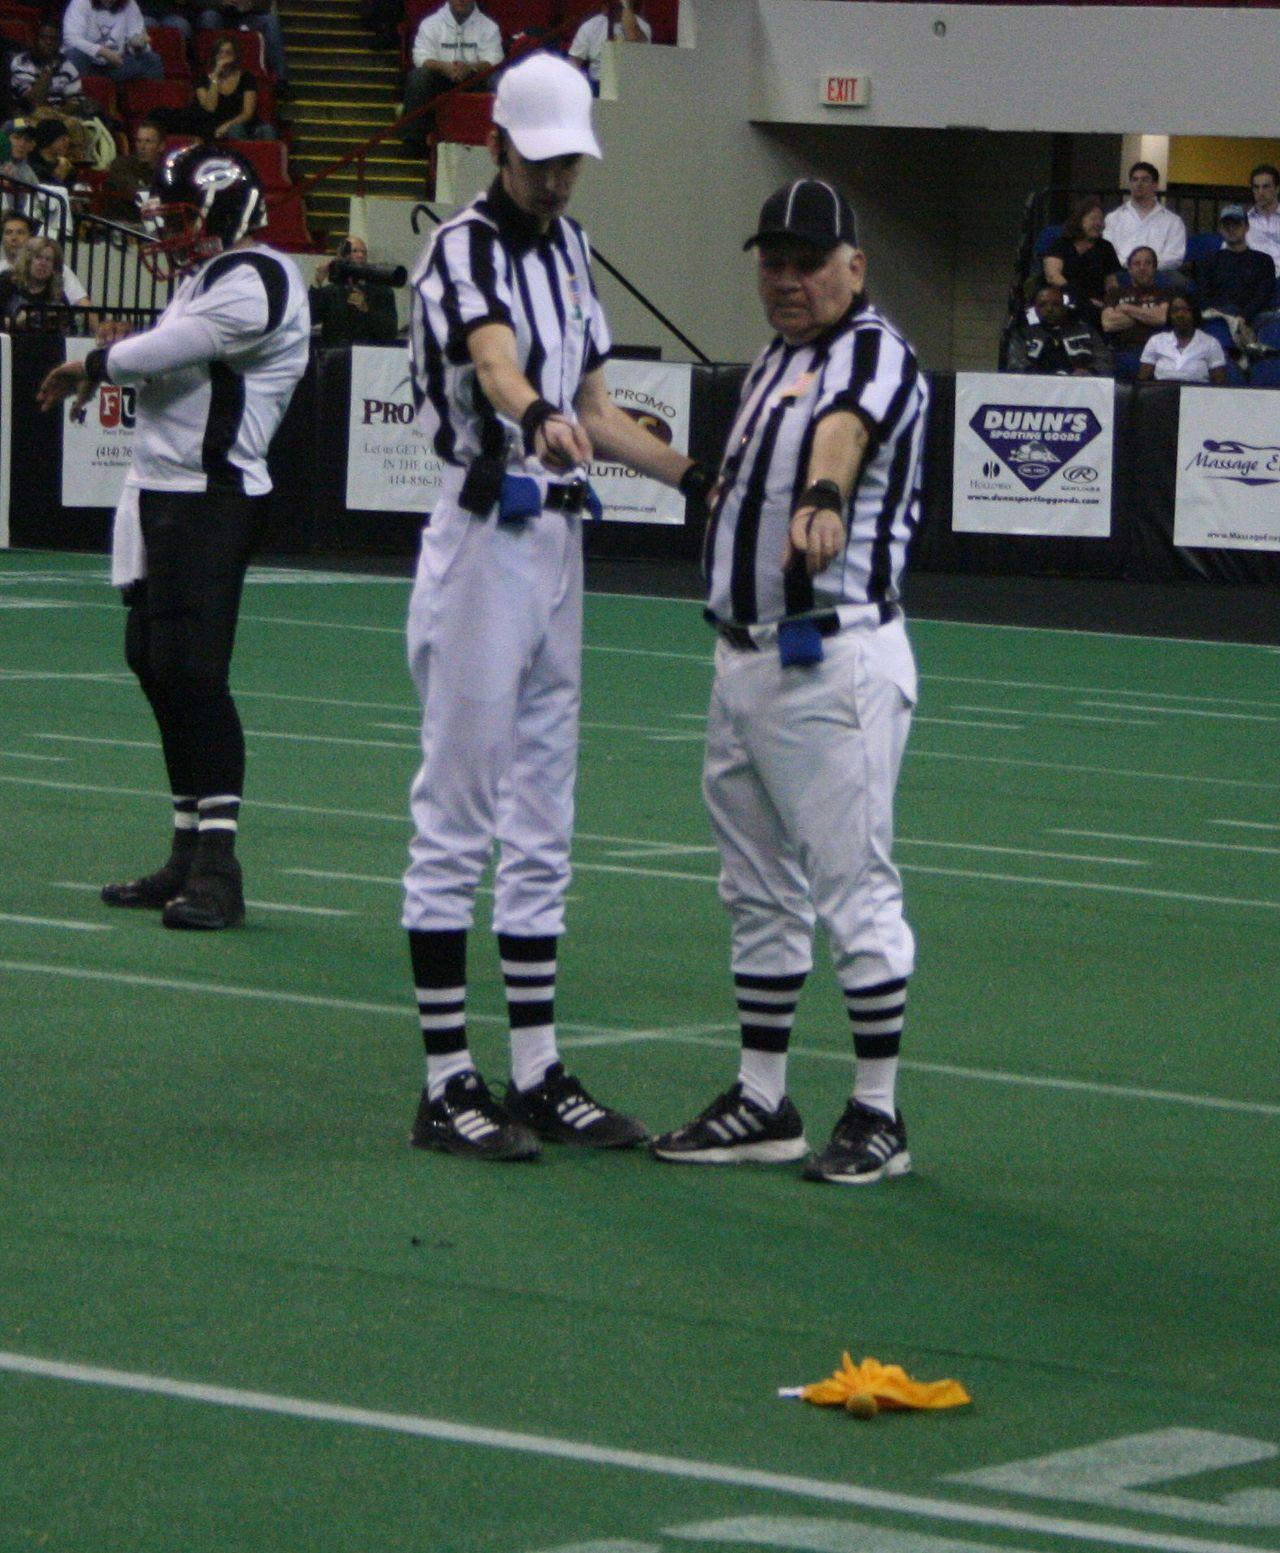 1280px-Referees.jpg